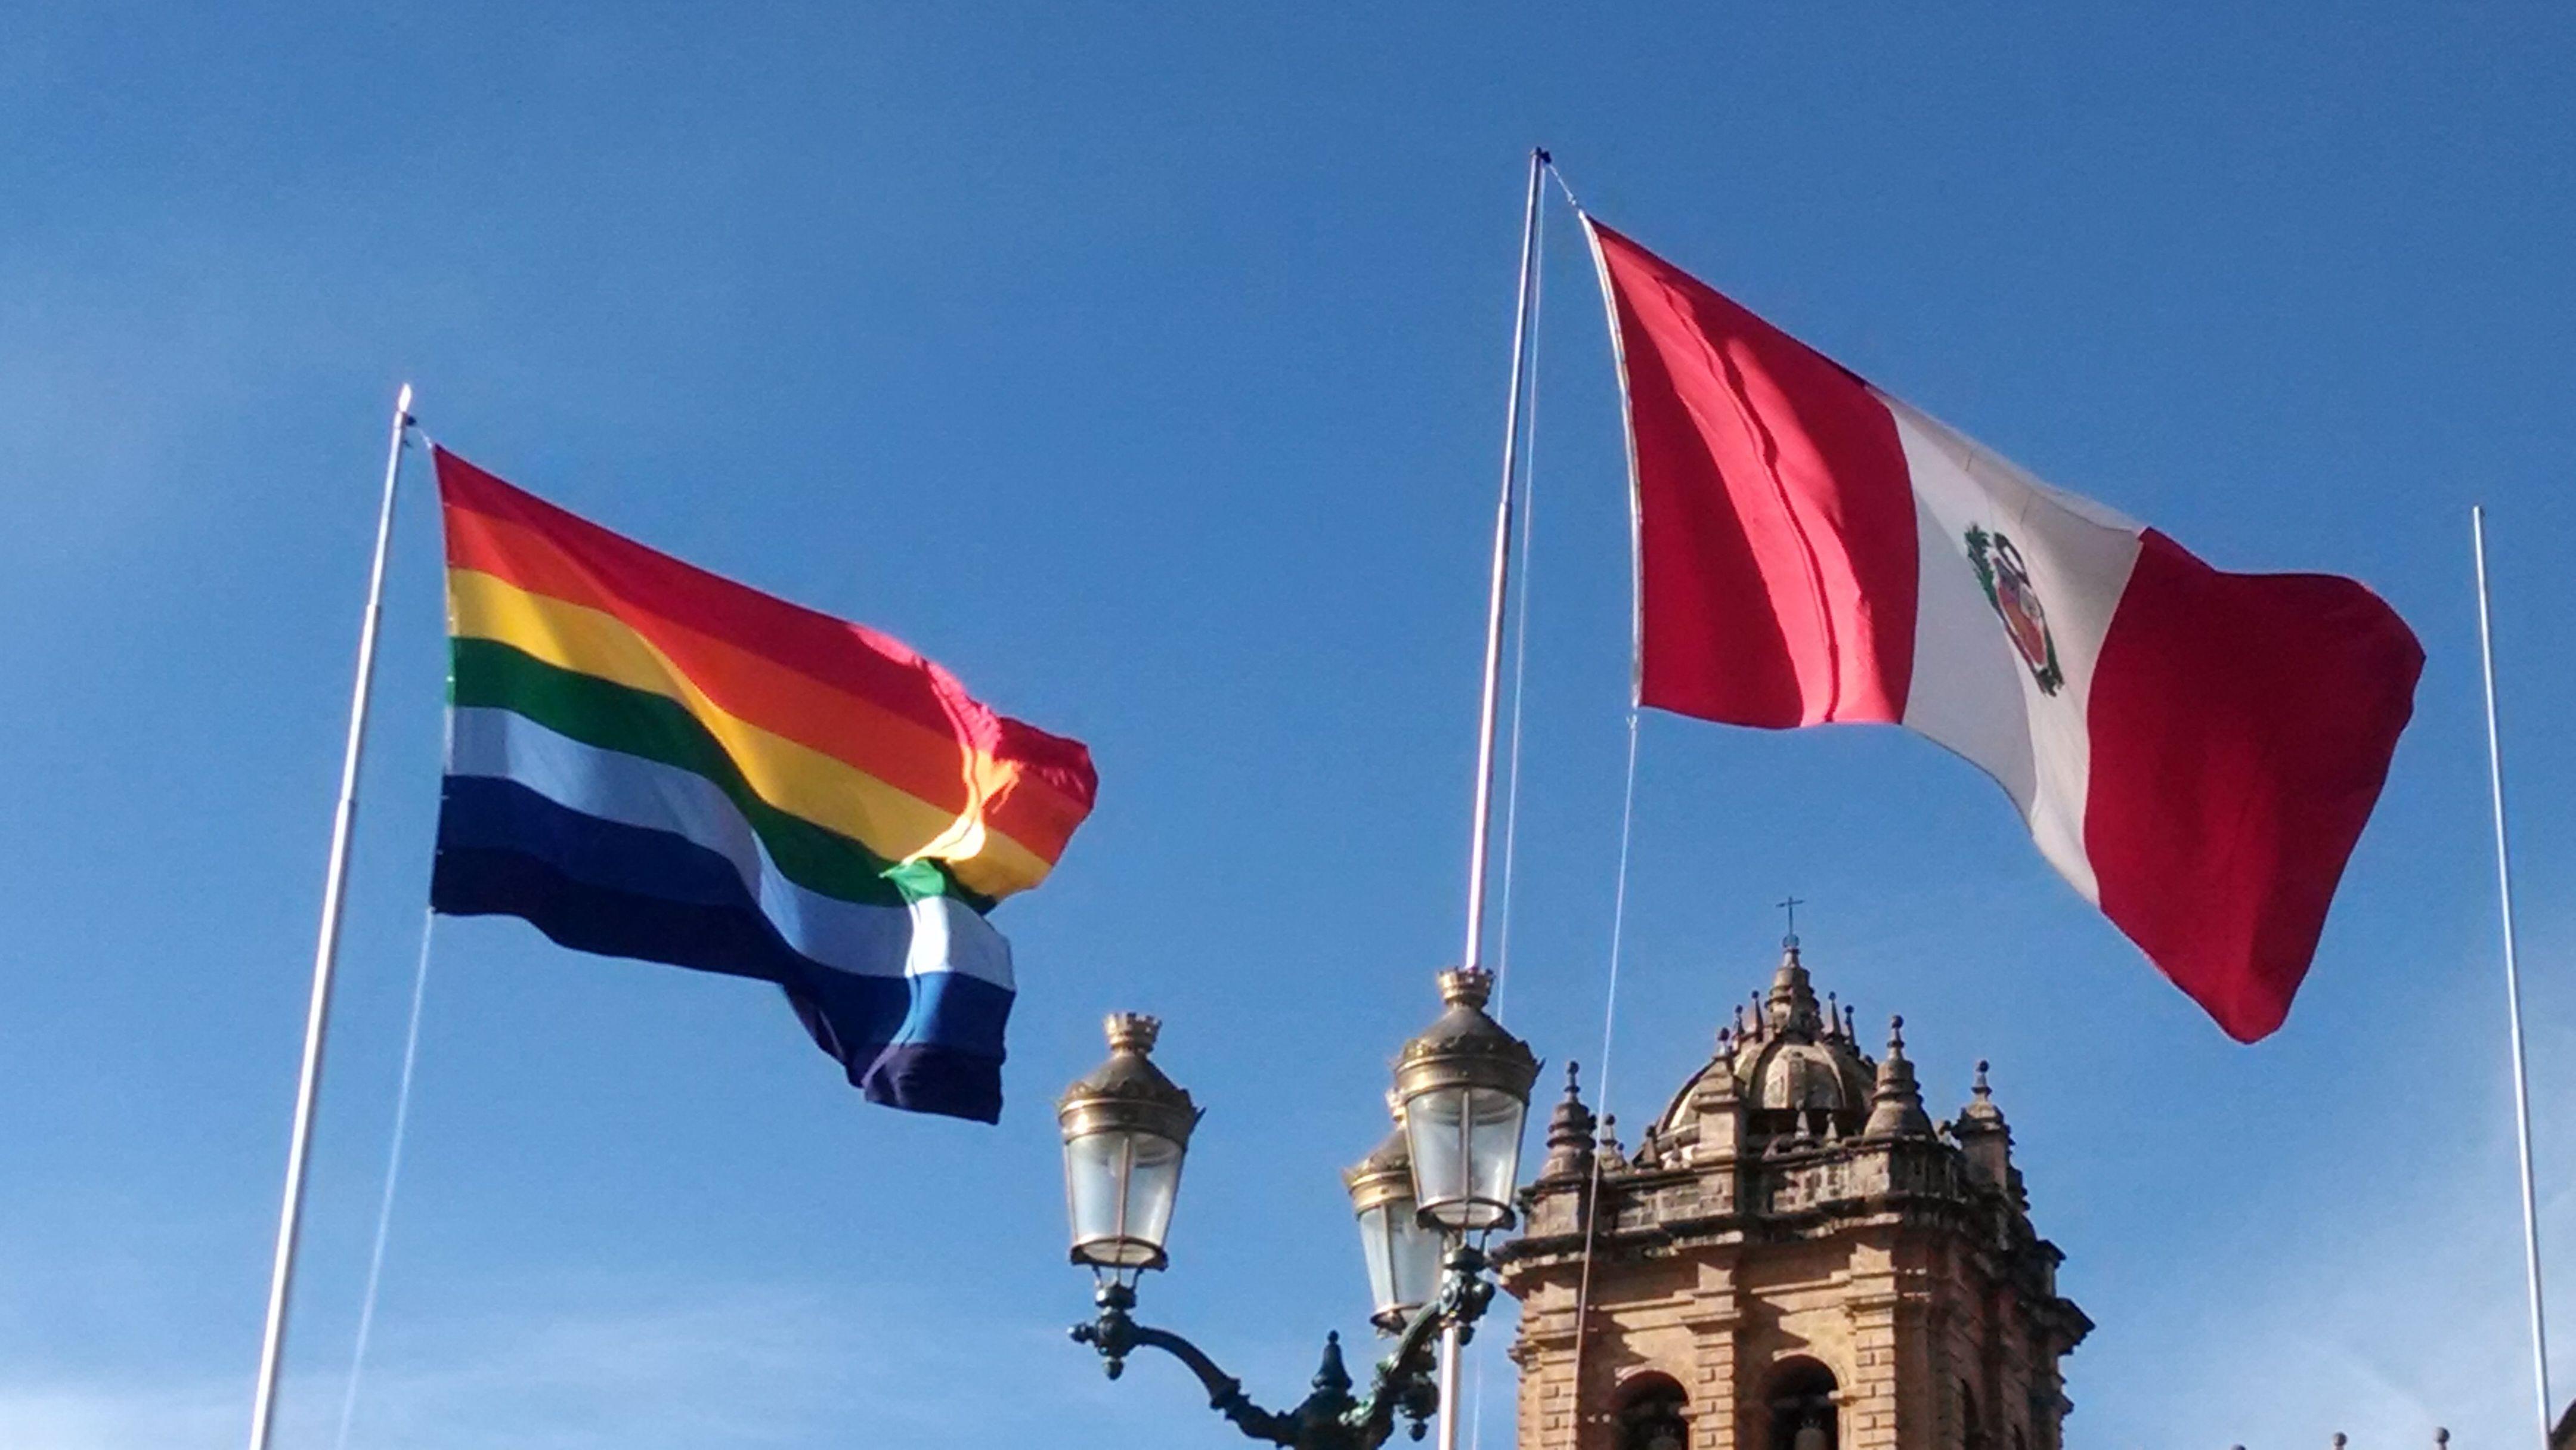 Cuzco and Peru flags Cusco flag, Peru flag, City flags